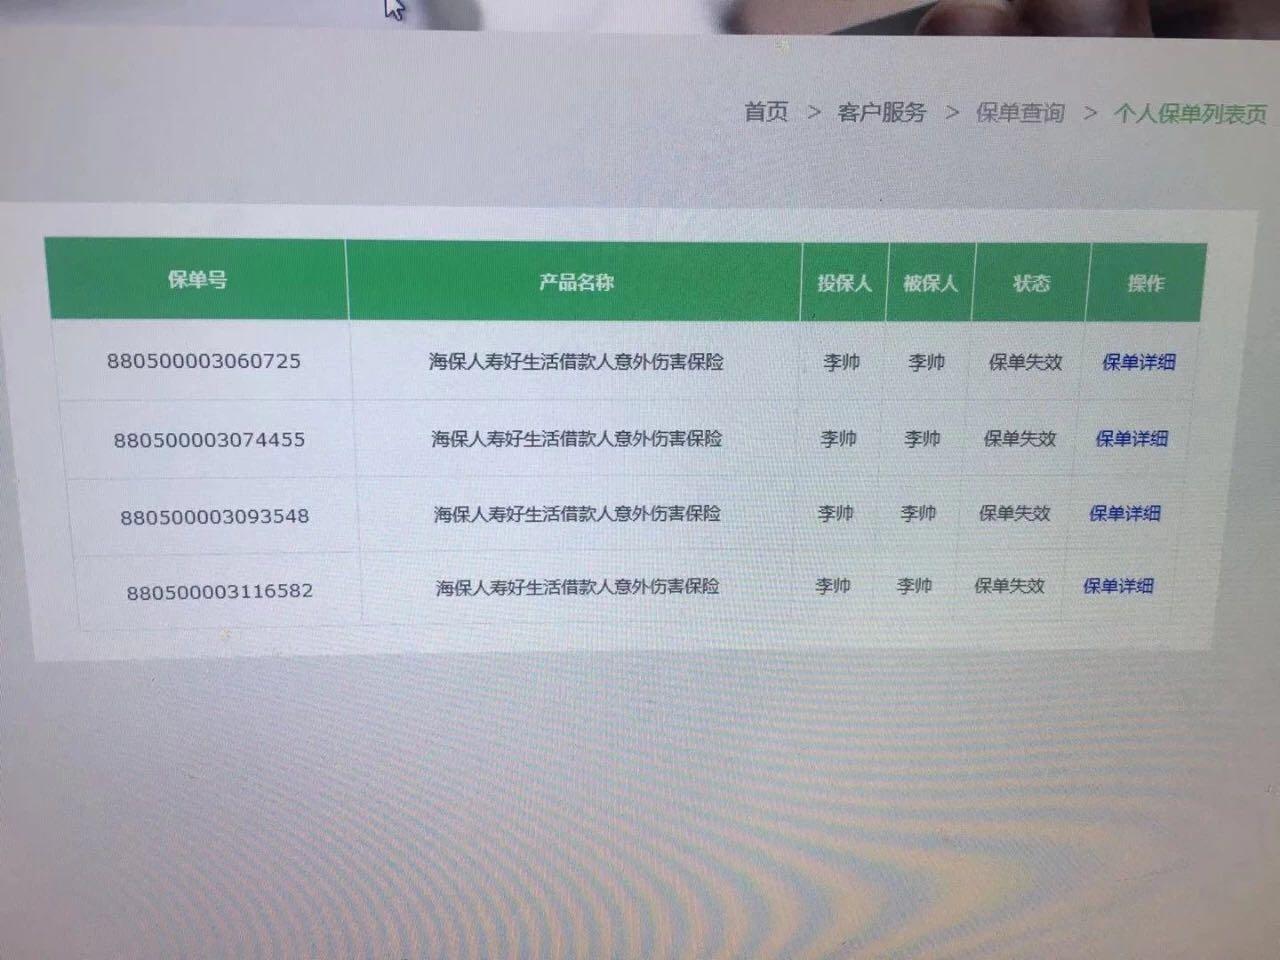 t6娱乐平台多久了·天台山第九届红枫节开幕